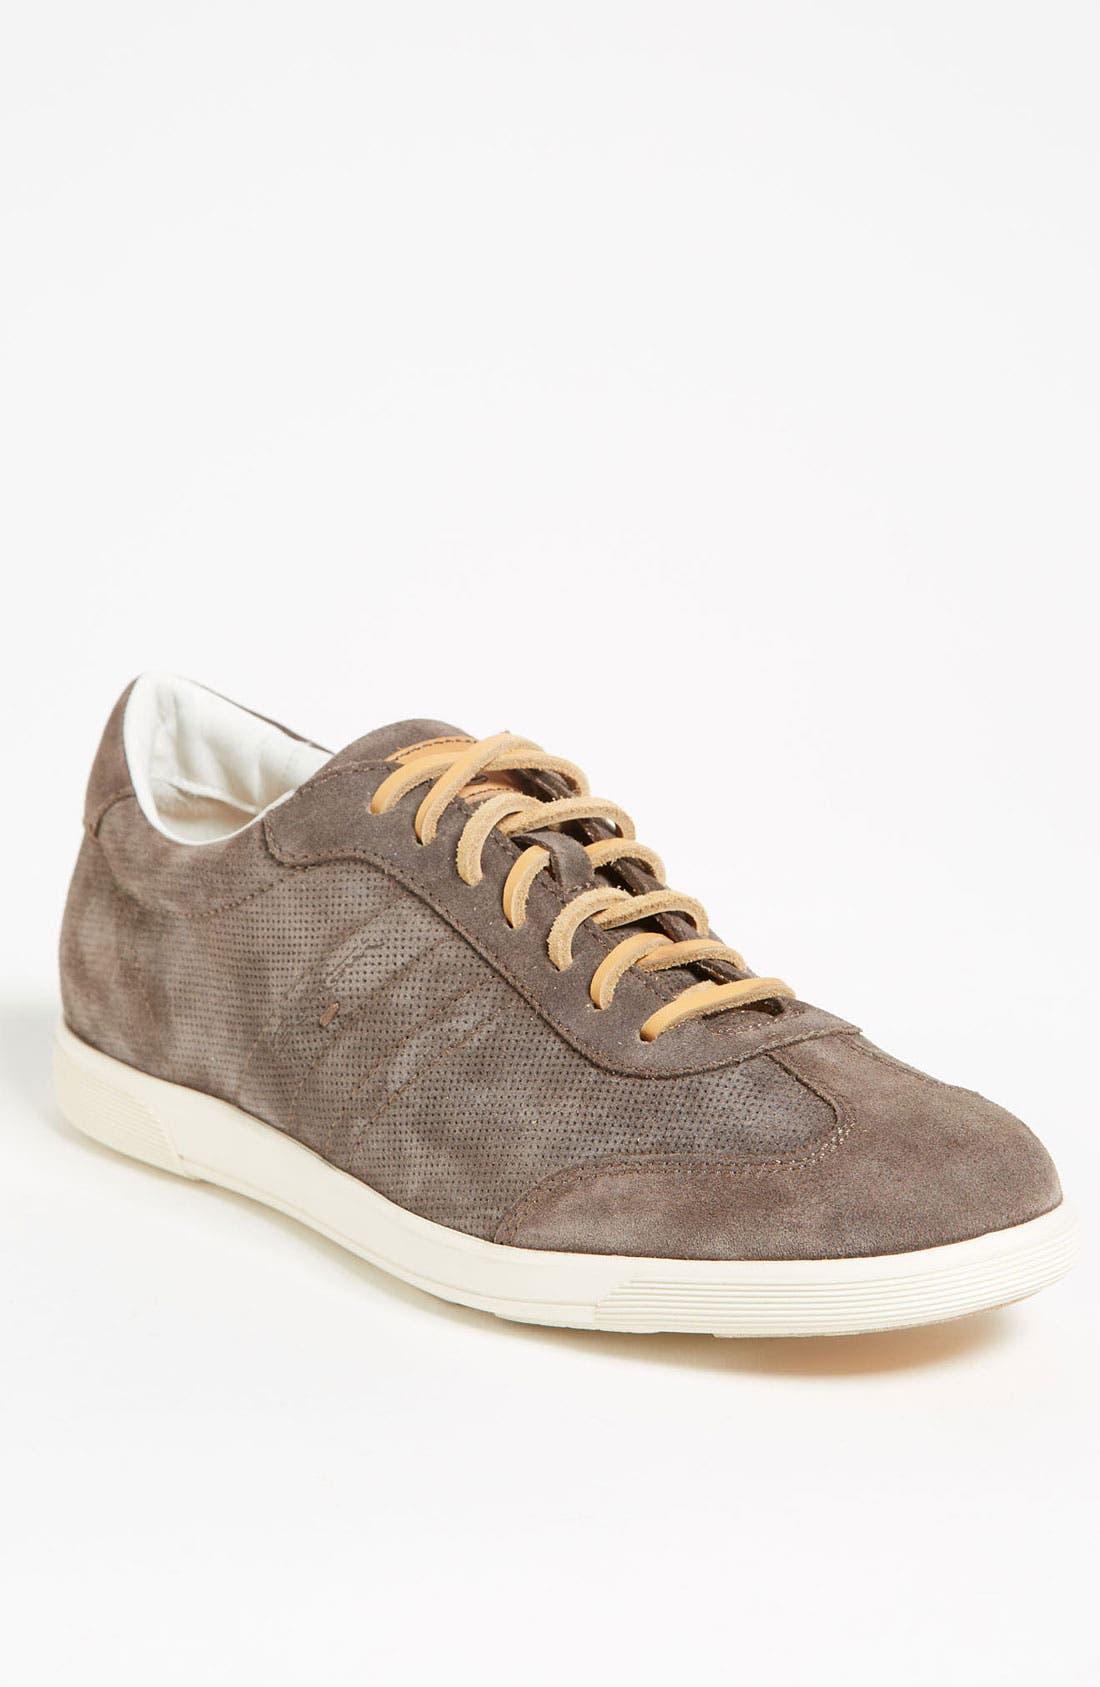 Main Image - Santoni 'Bonito' Sneaker